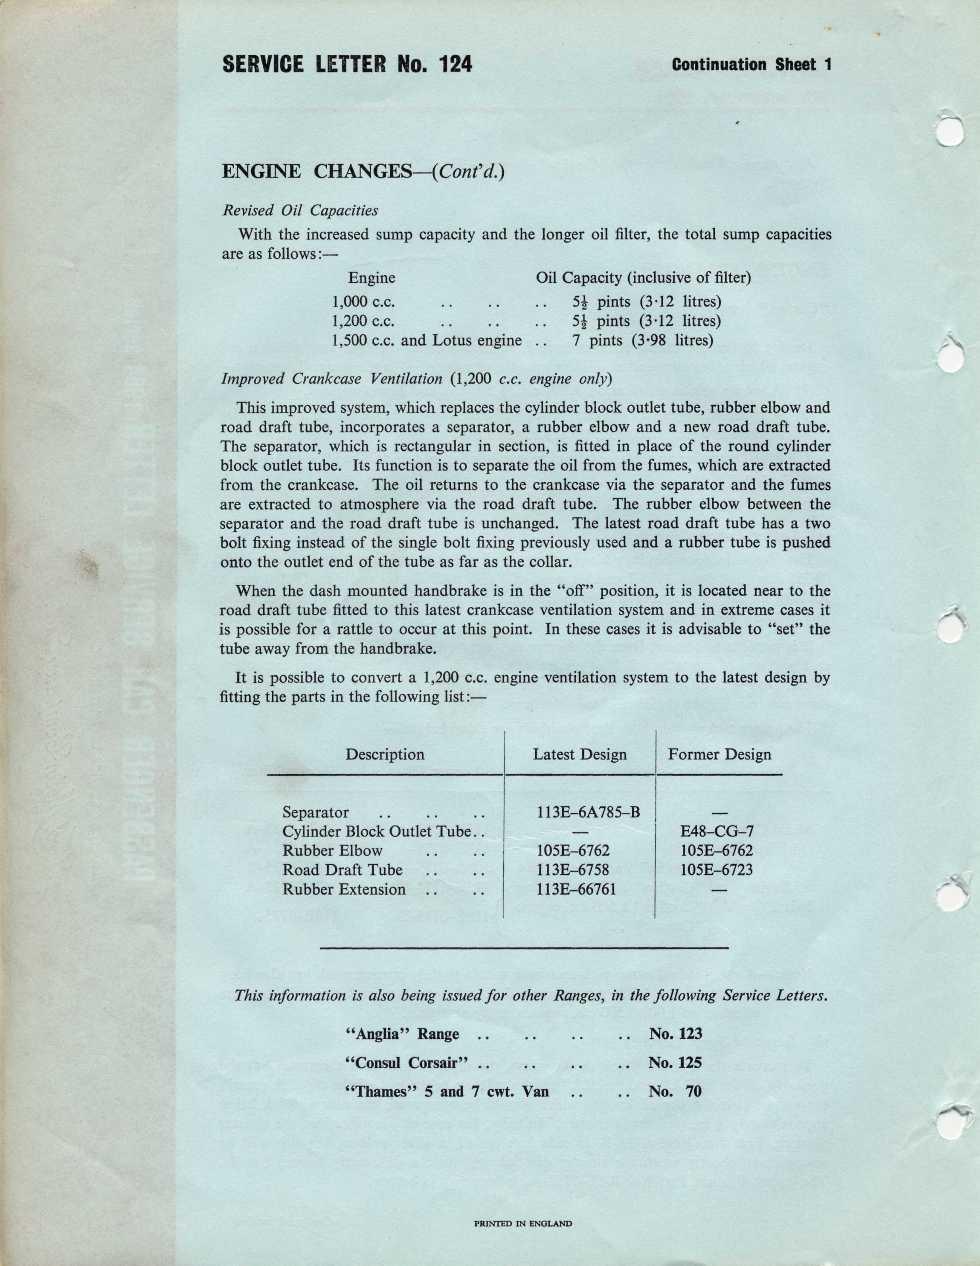 80-change-service-engine-changes-2